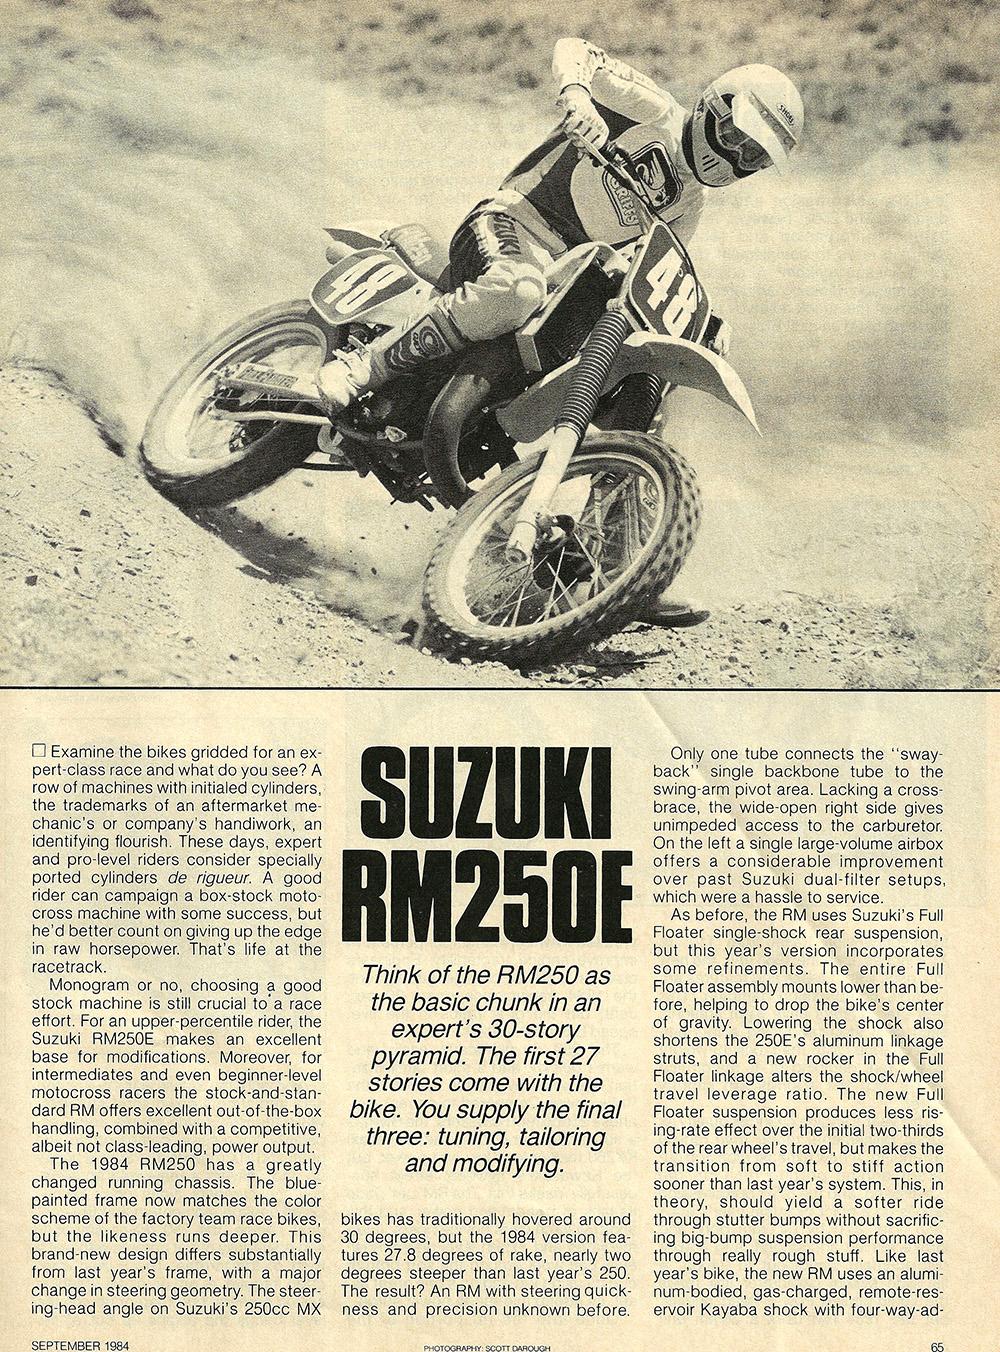 1984 Suzuki RM250 E road test 01.jpg